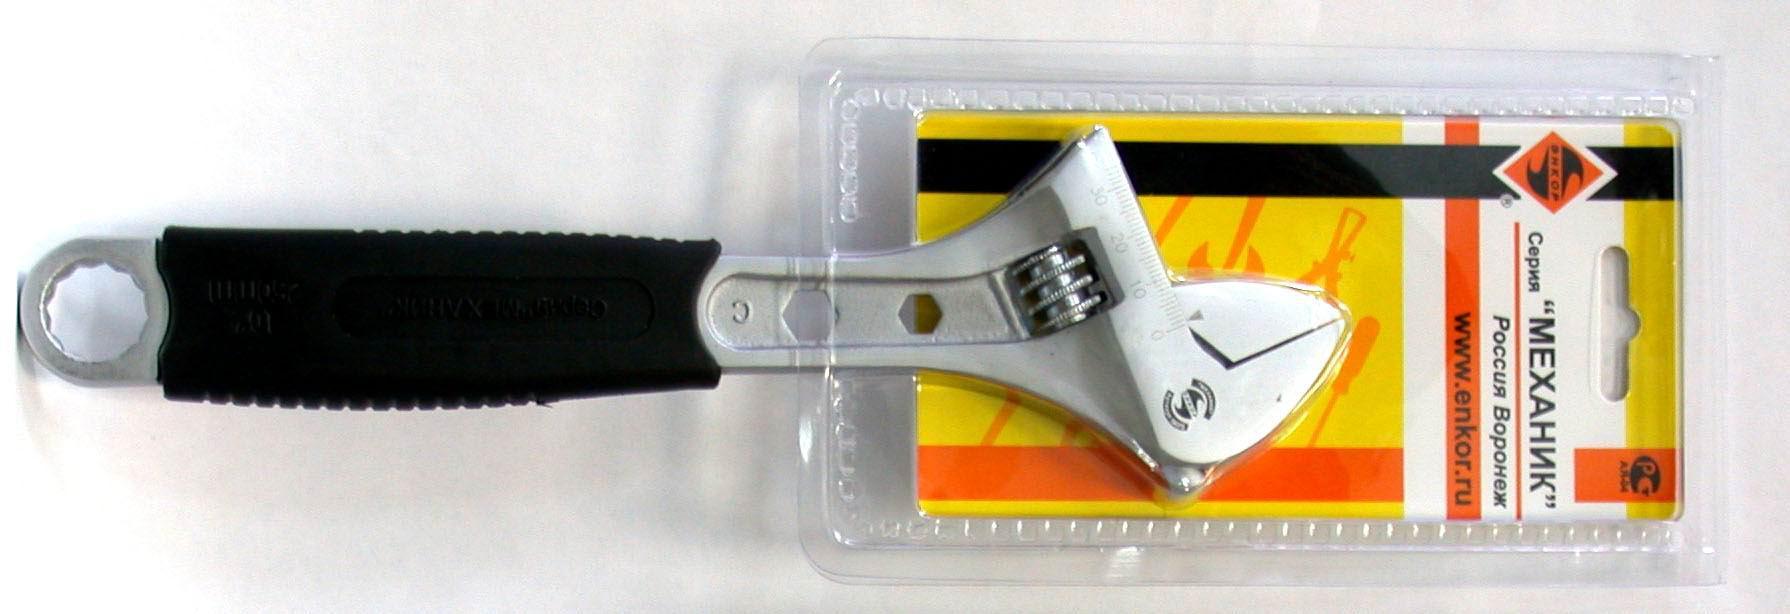 Ключ ЭНКОР 19073 (0 - 30 мм) ключ разводной truper pet